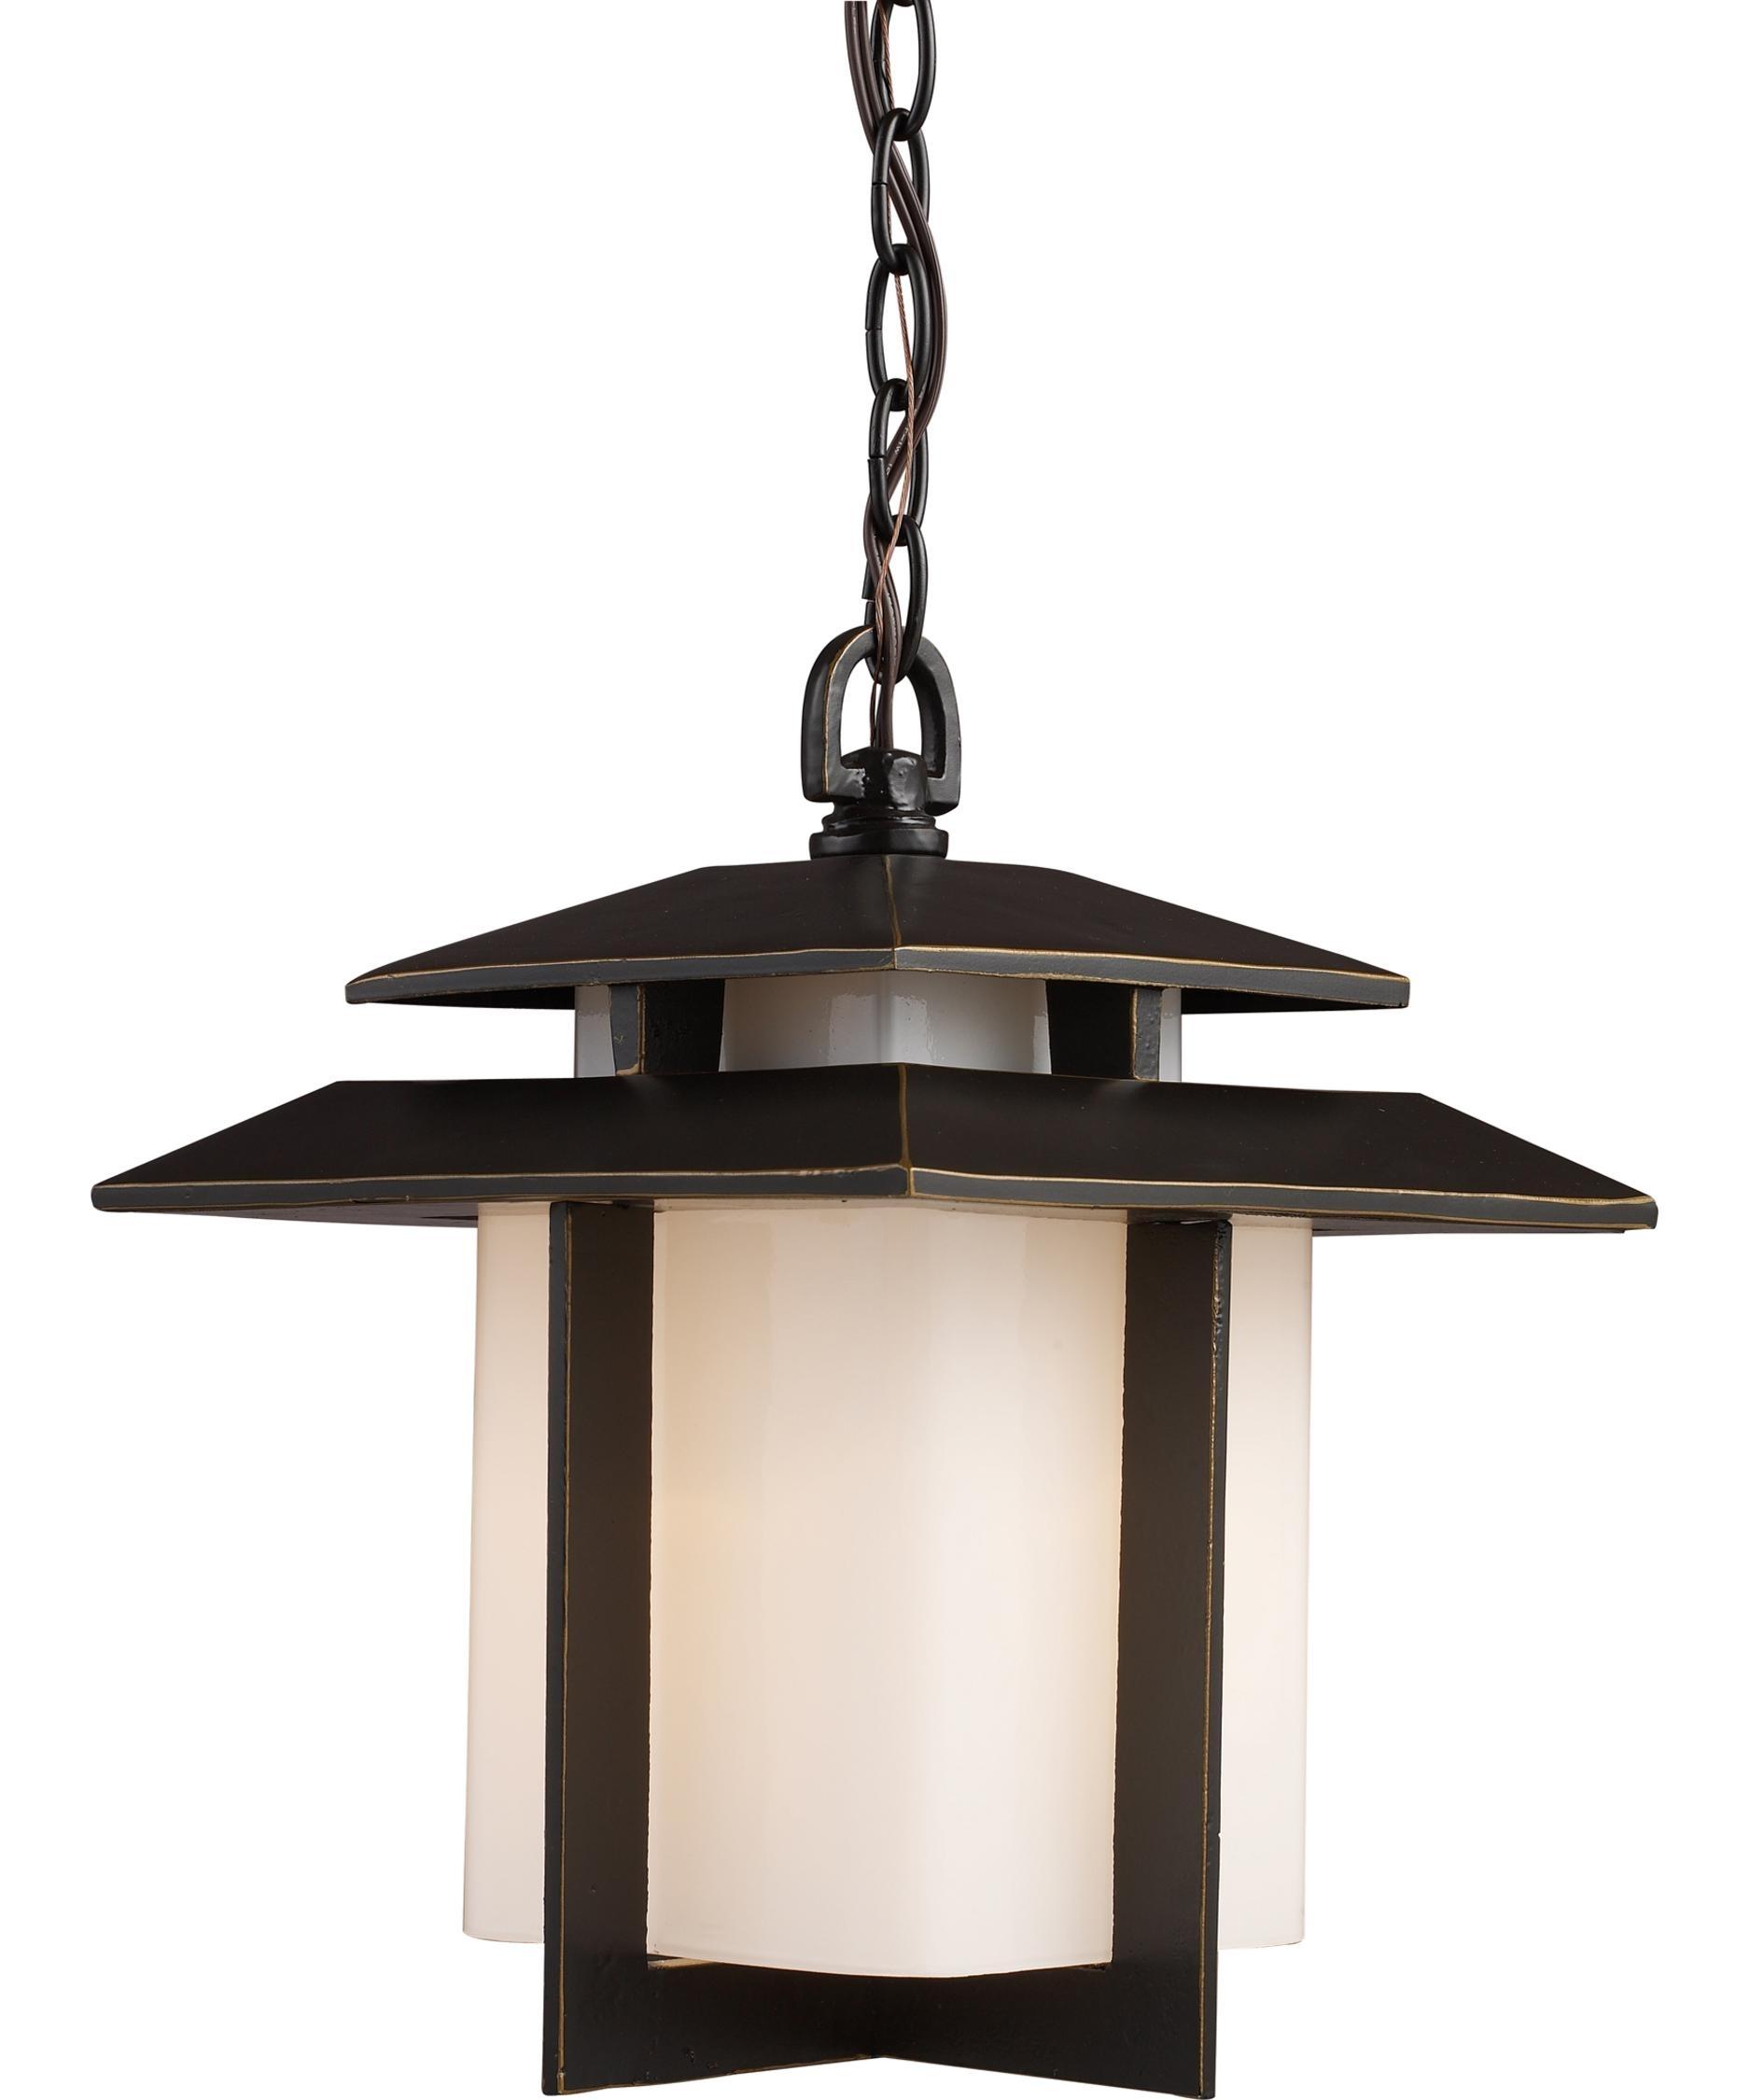 Light : Outdoor Lighting Ideas Without Electricity Exterior Fixtures With Regard To Outdoor Lighting Pendant Fixtures (View 6 of 15)